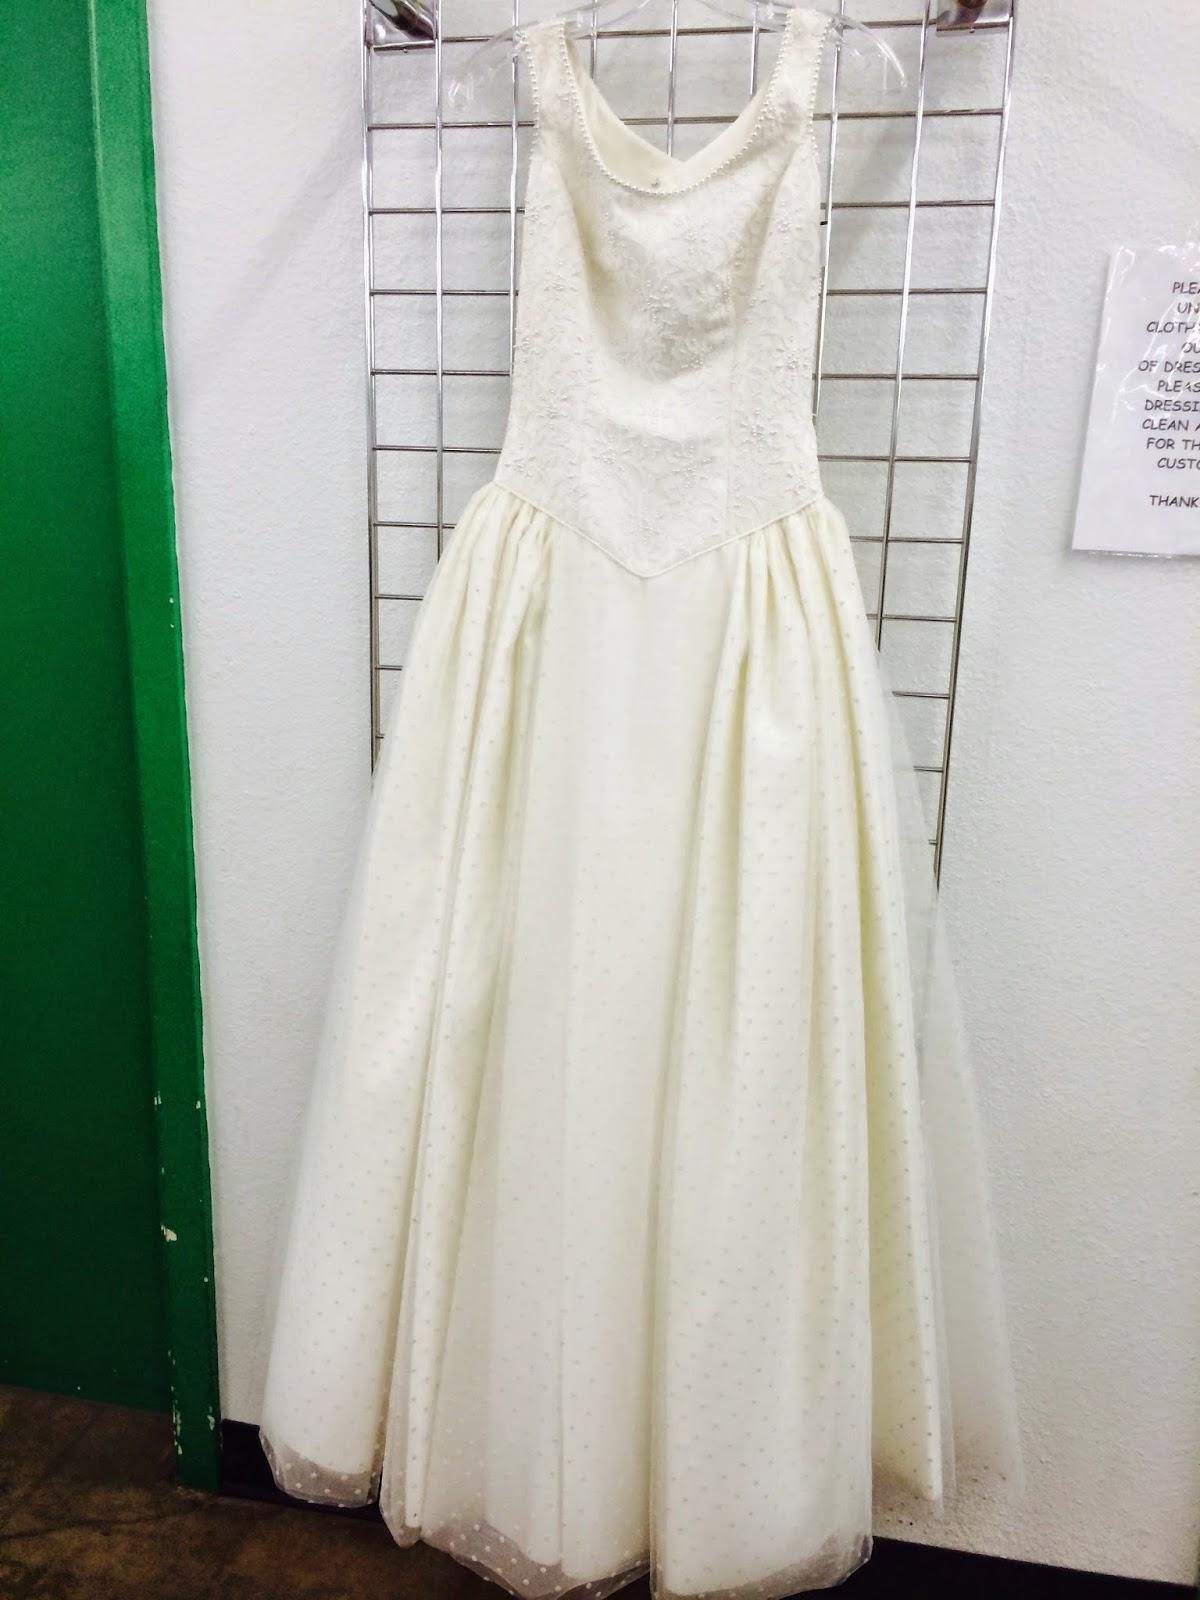 Thrift Store Wedding Dresses 30 Good Biblical Homemaking